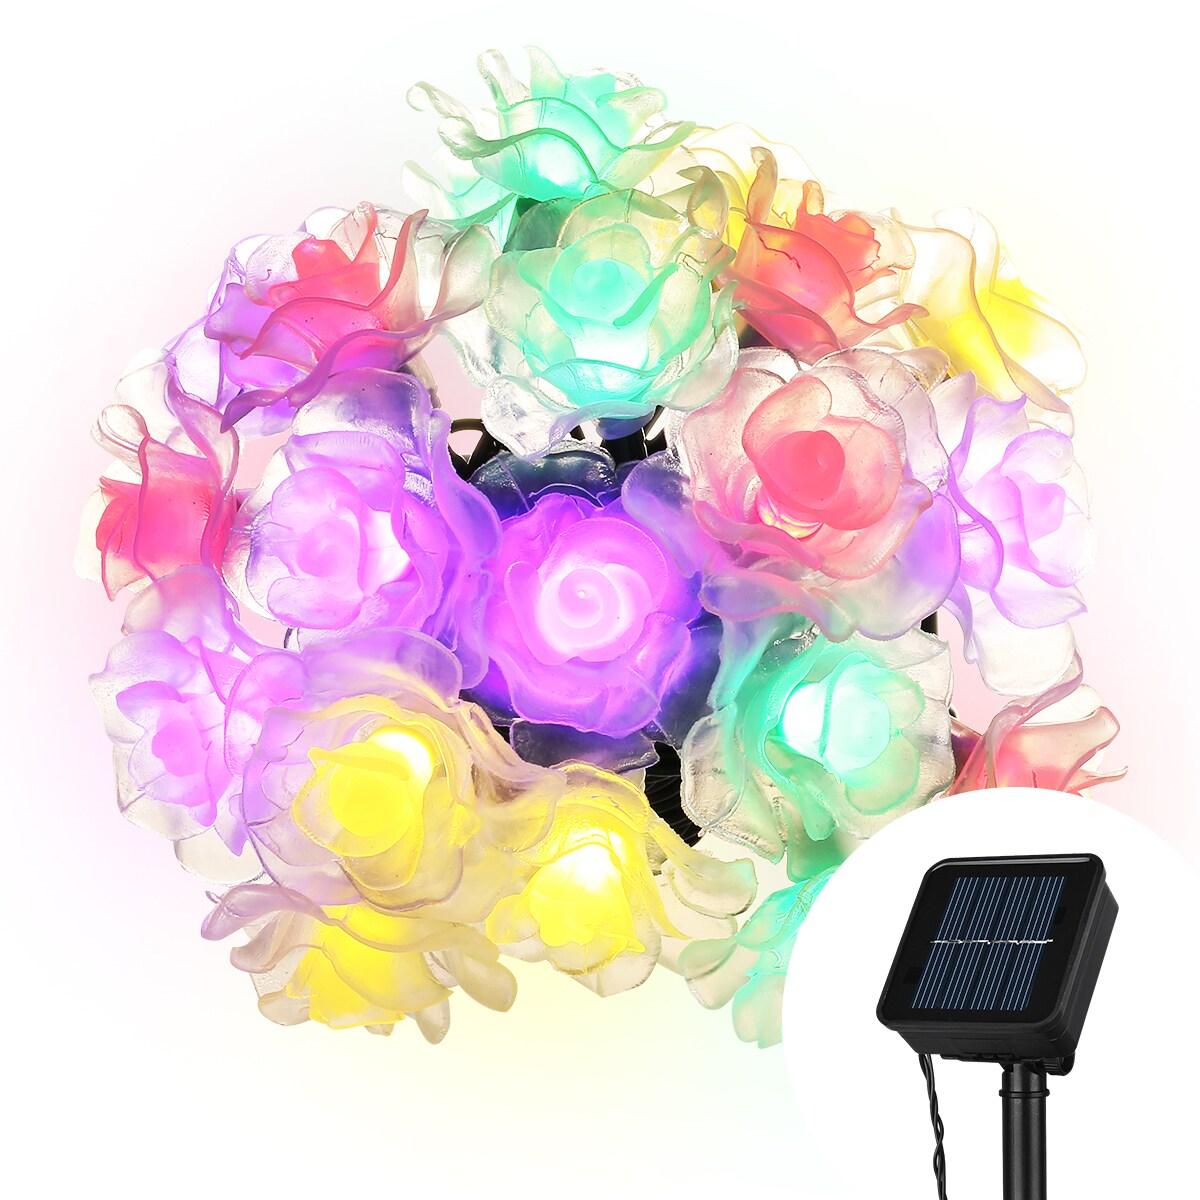 Coutlet Outdoor Solar String Lights, Cymas Waterproof Dec...